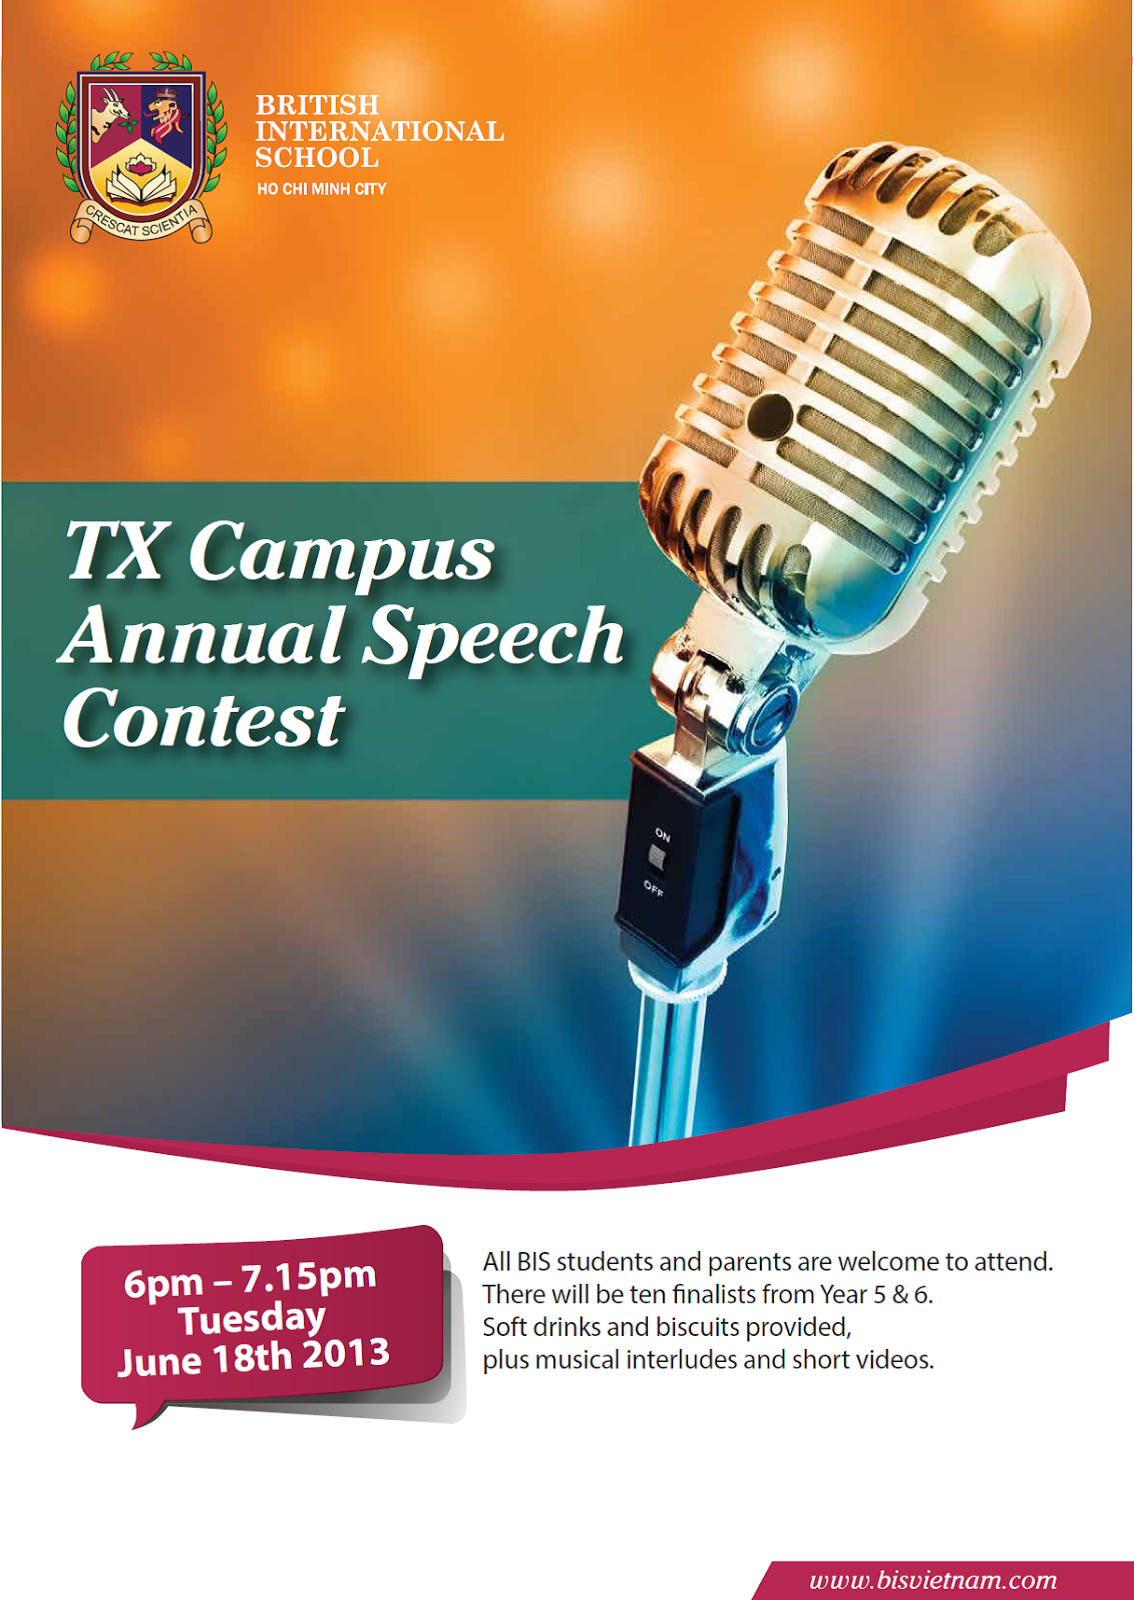 Nice Speech Contest Flyer Design Toastmasters Pinterest